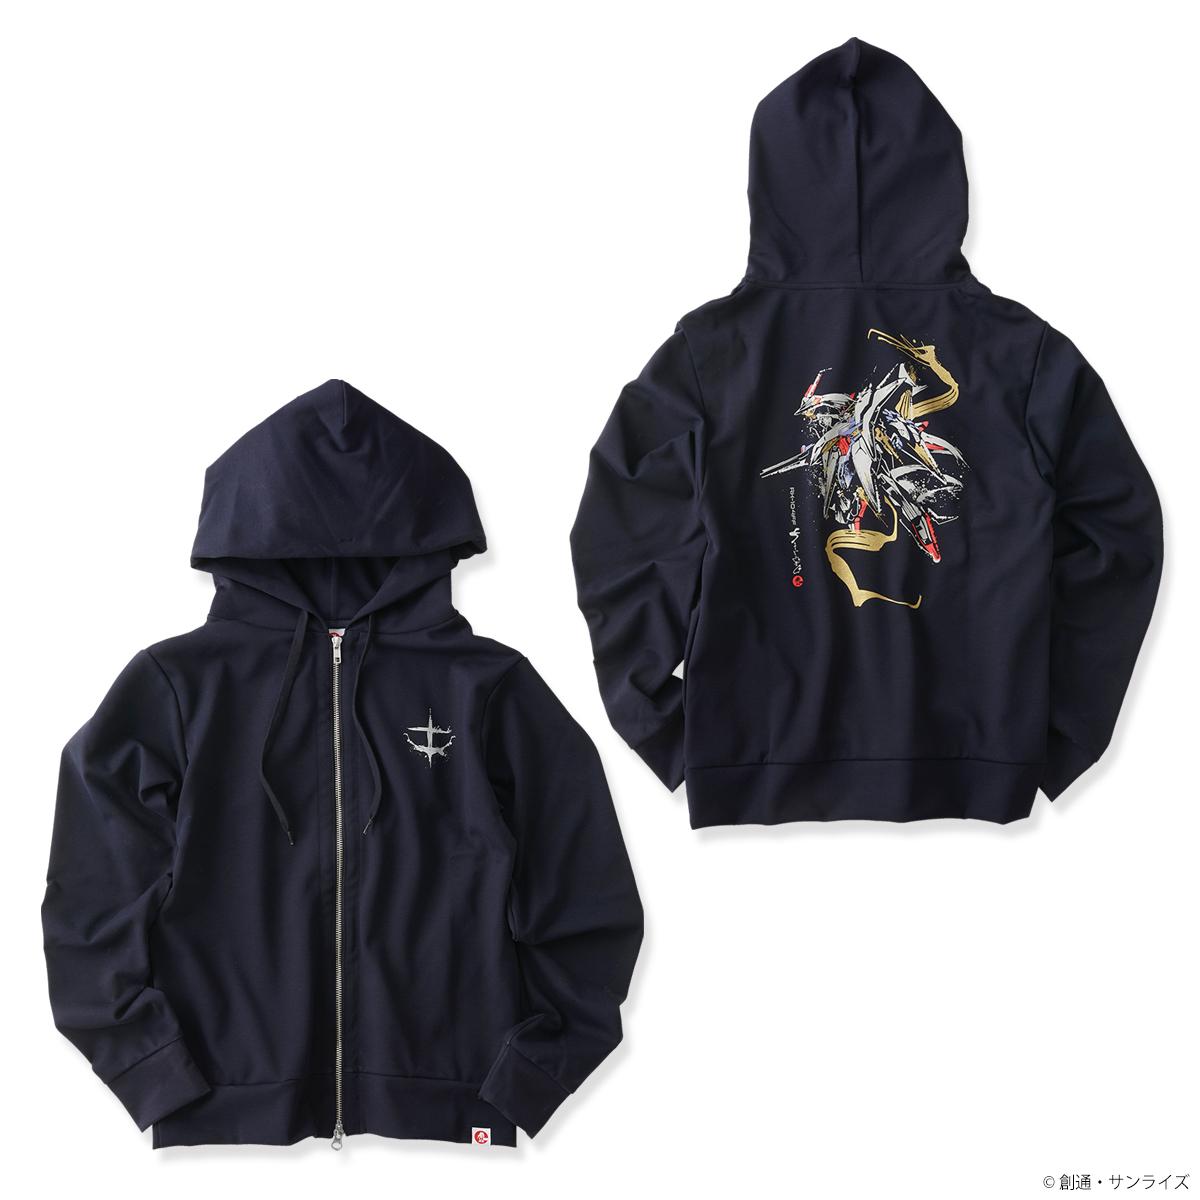 Penelope Hoodie—Mobile Suit Gundam Hathaway/STRICT-G JAPAN Collaboration